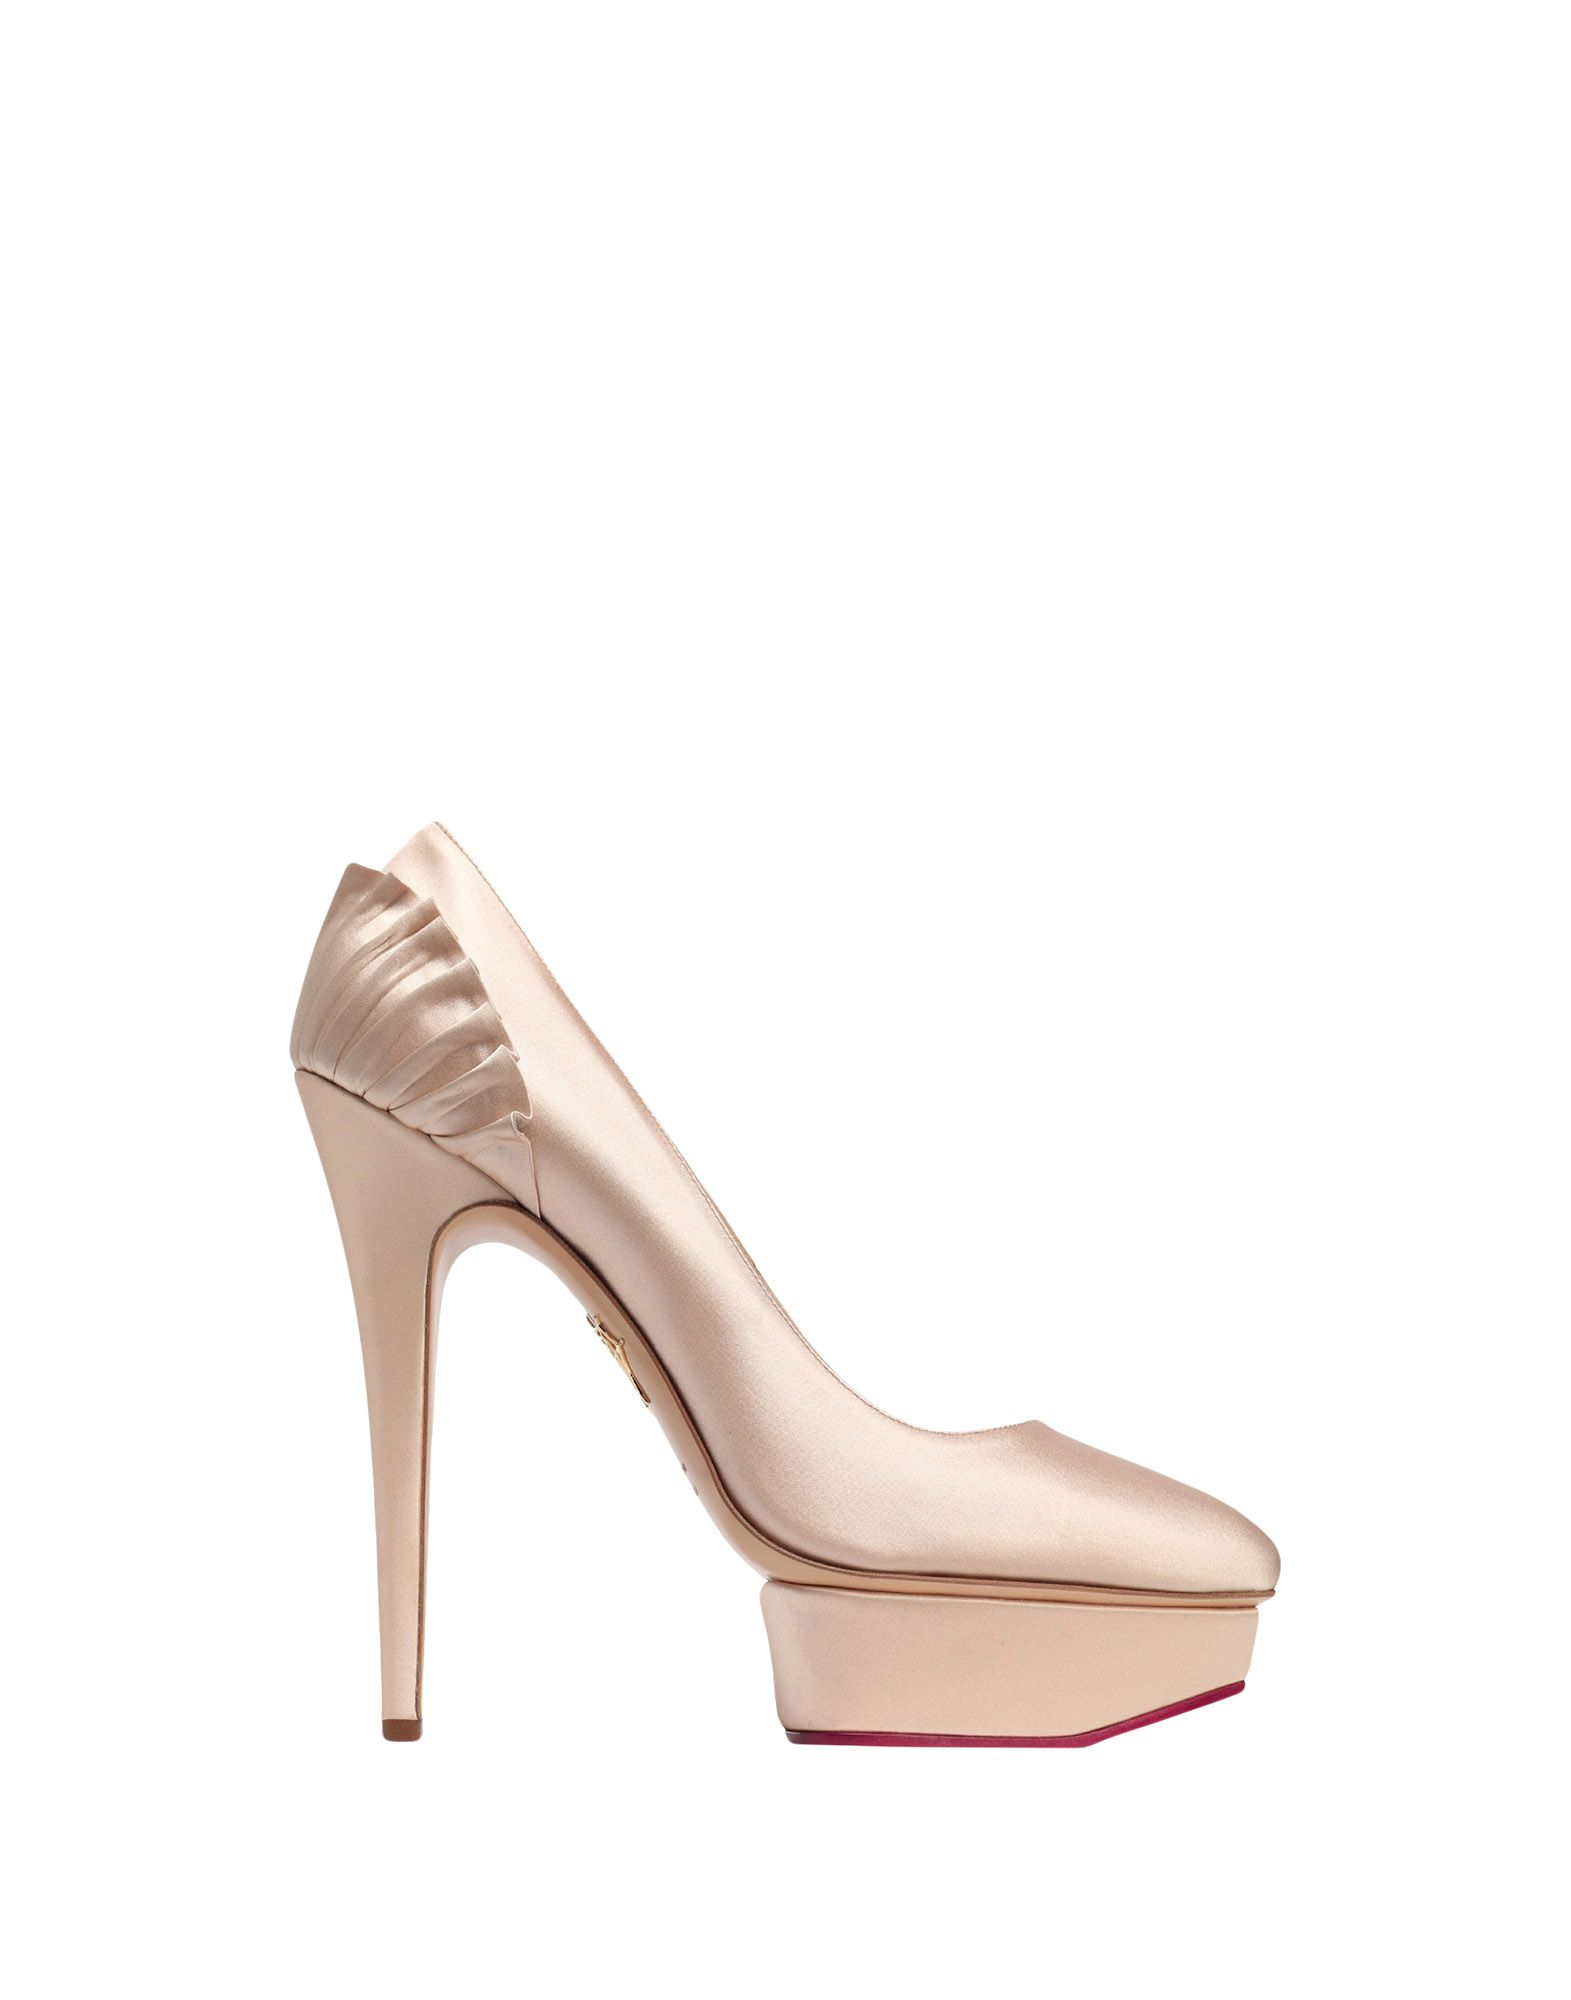 Charlotte Olympia Pumps Damen Beliebte  11514795VQ Beliebte Damen Schuhe ab65d1